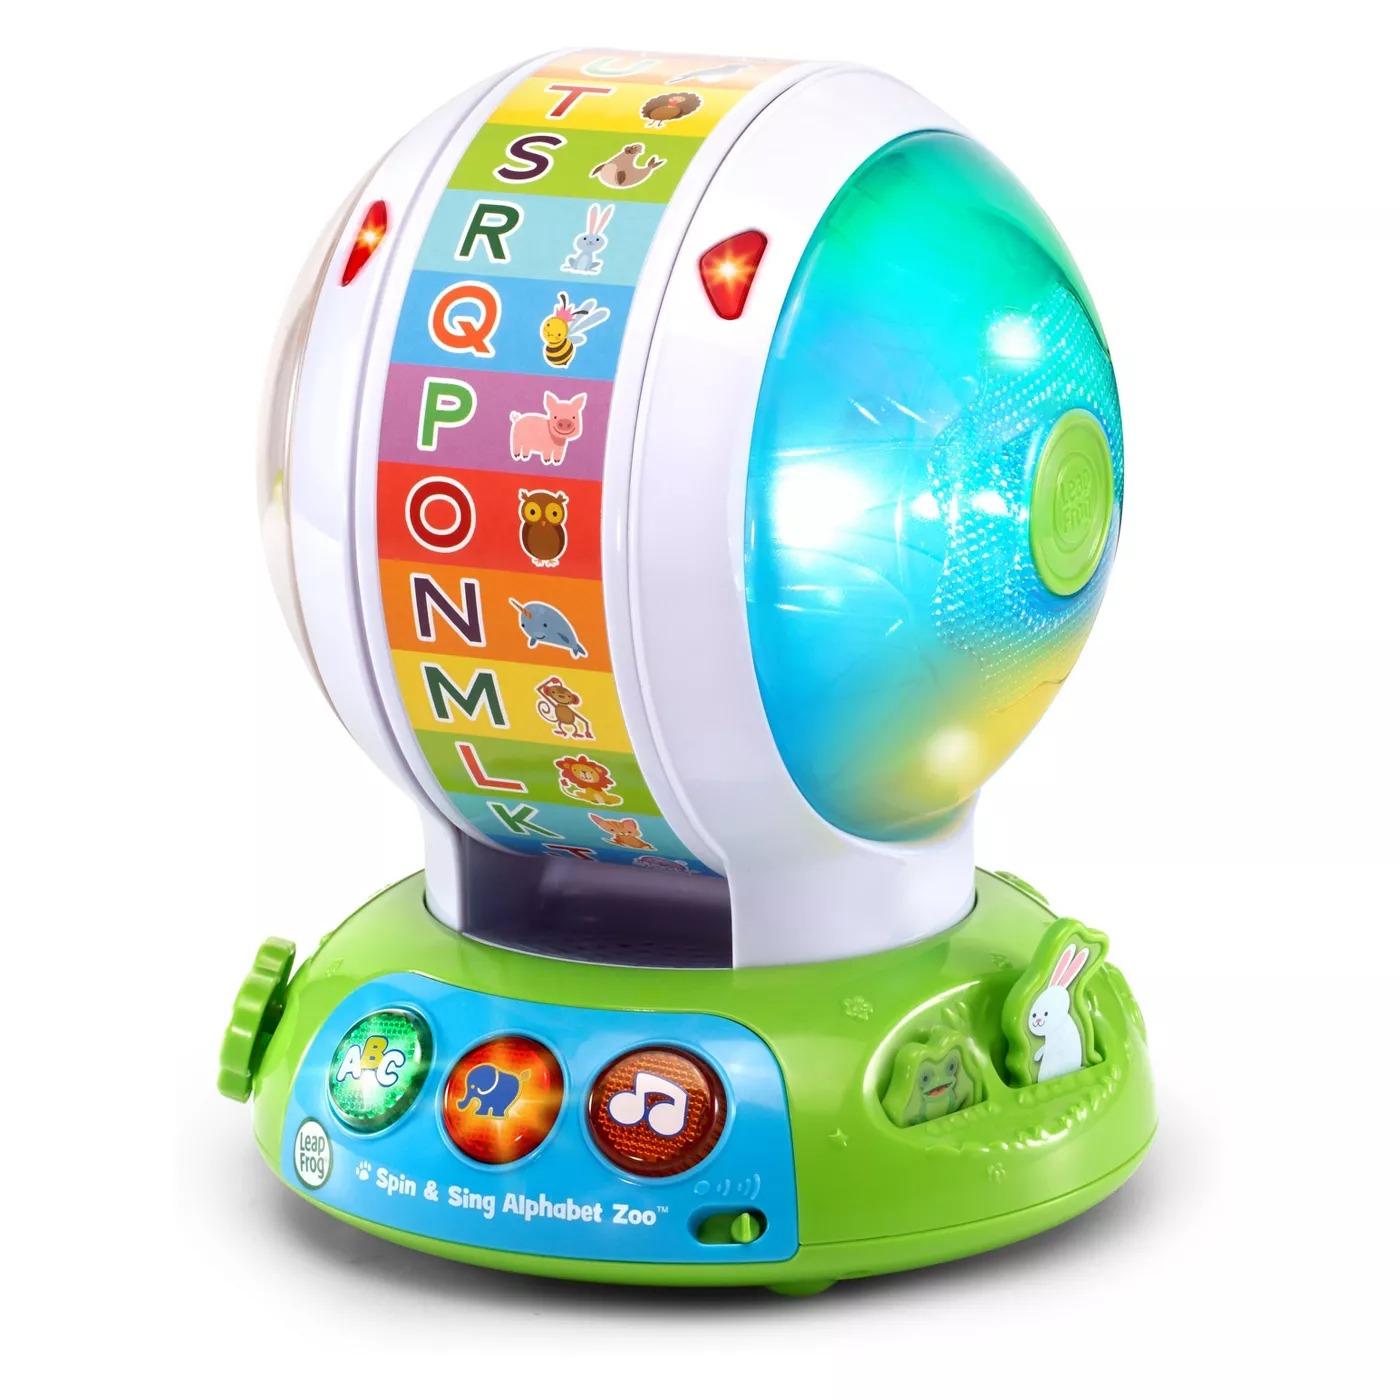 LeapFrog-Spin-Sing-Alphabet-Zoo